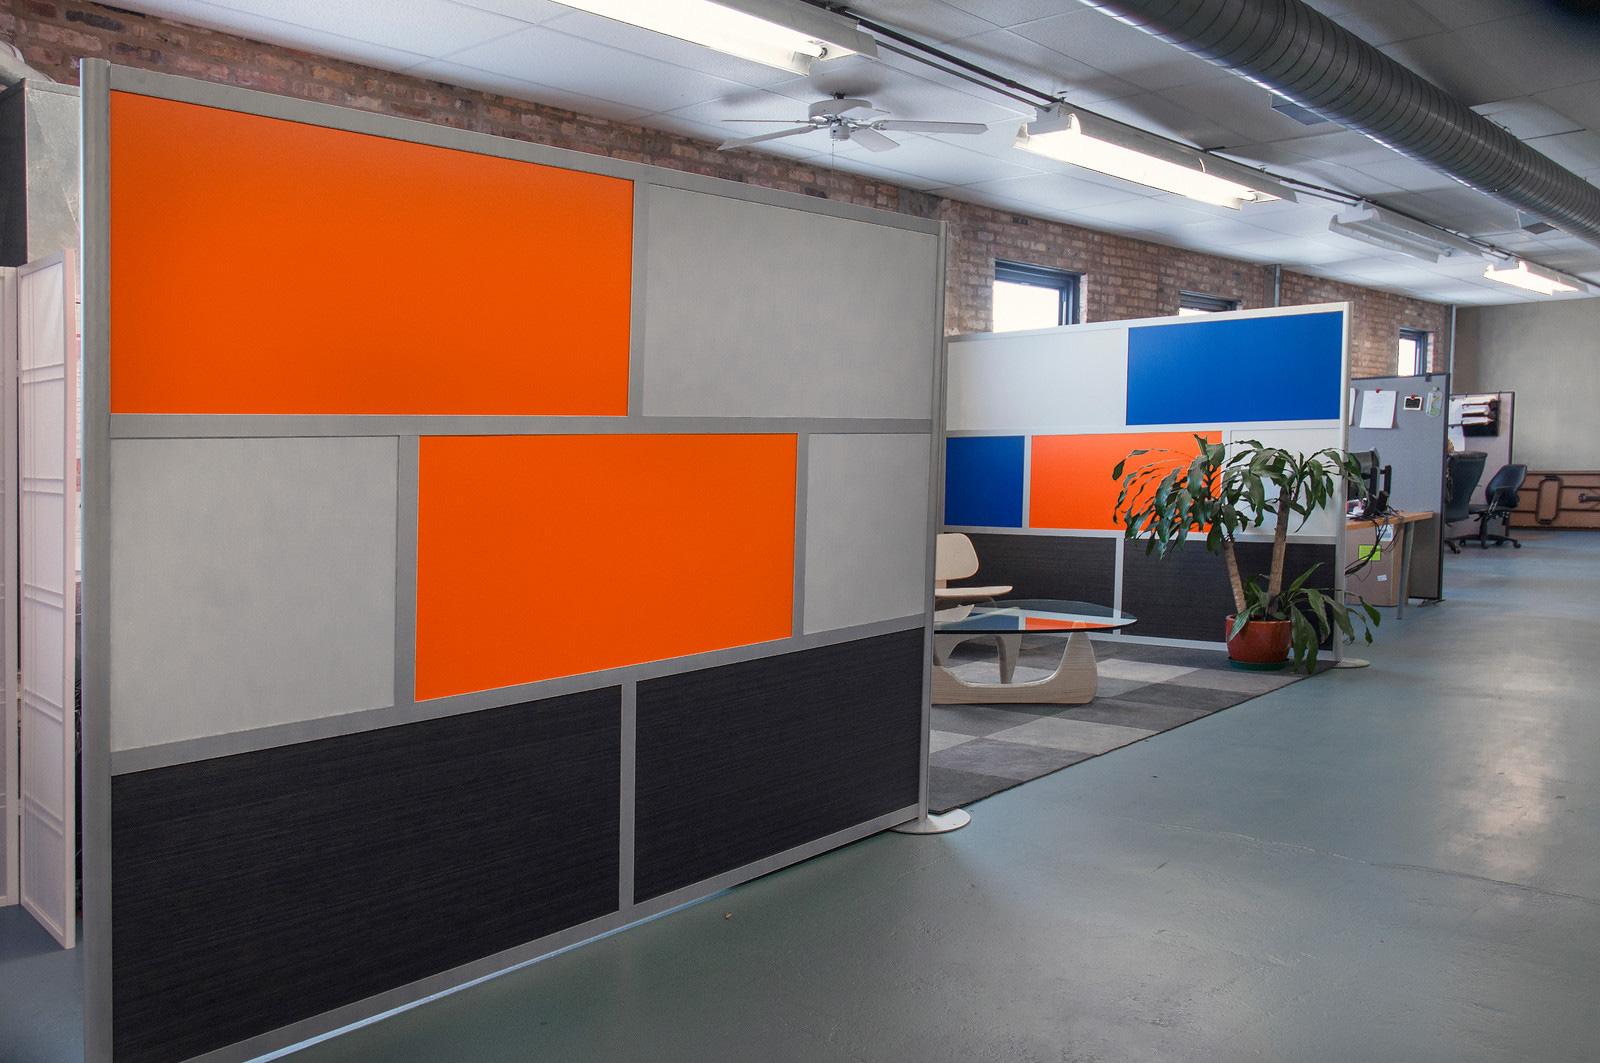 furniture-cubicles-in-sarasota-florida-2-.jpg